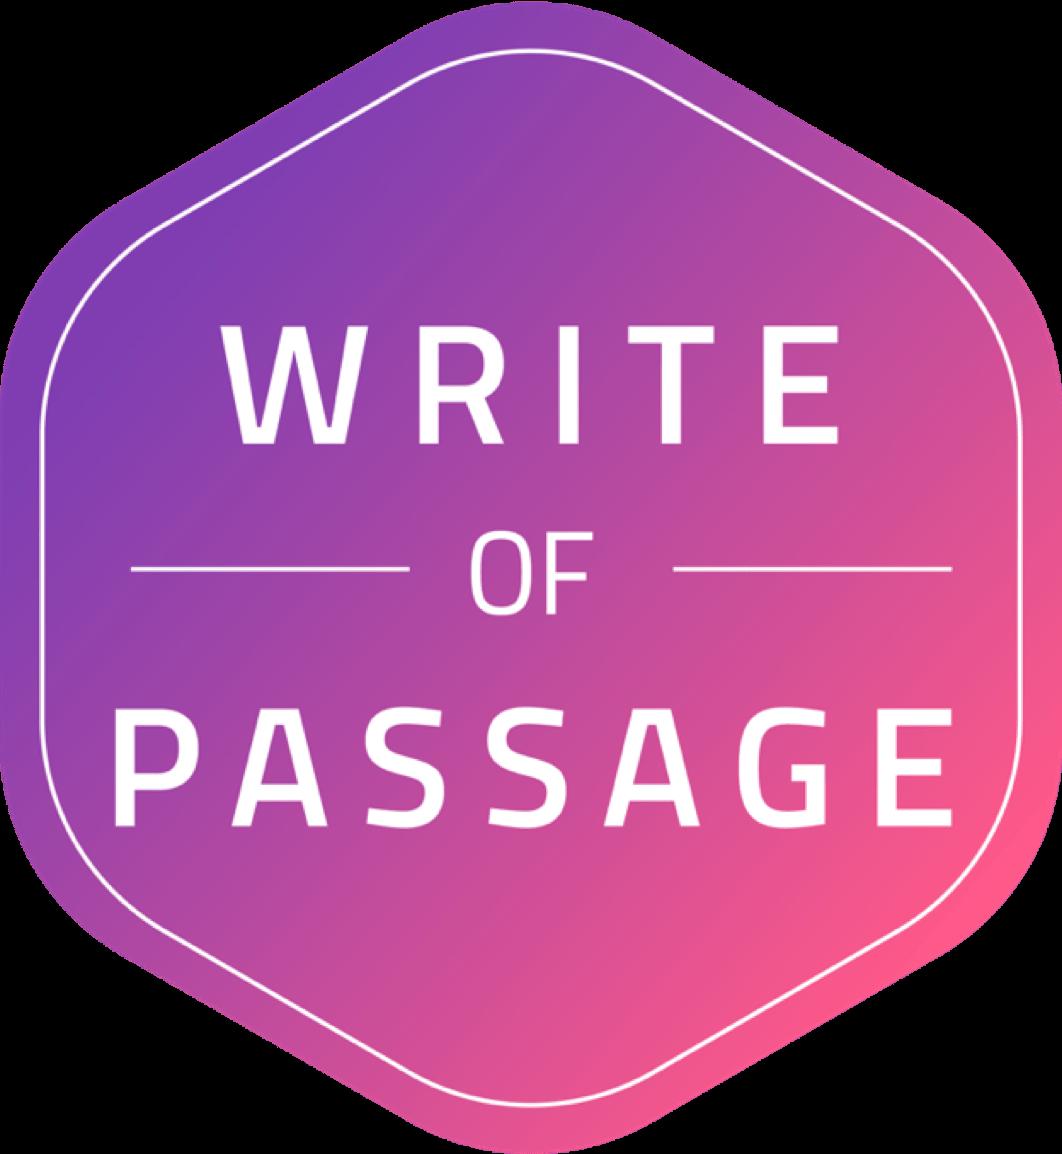 Premium Edition - Write of Passage